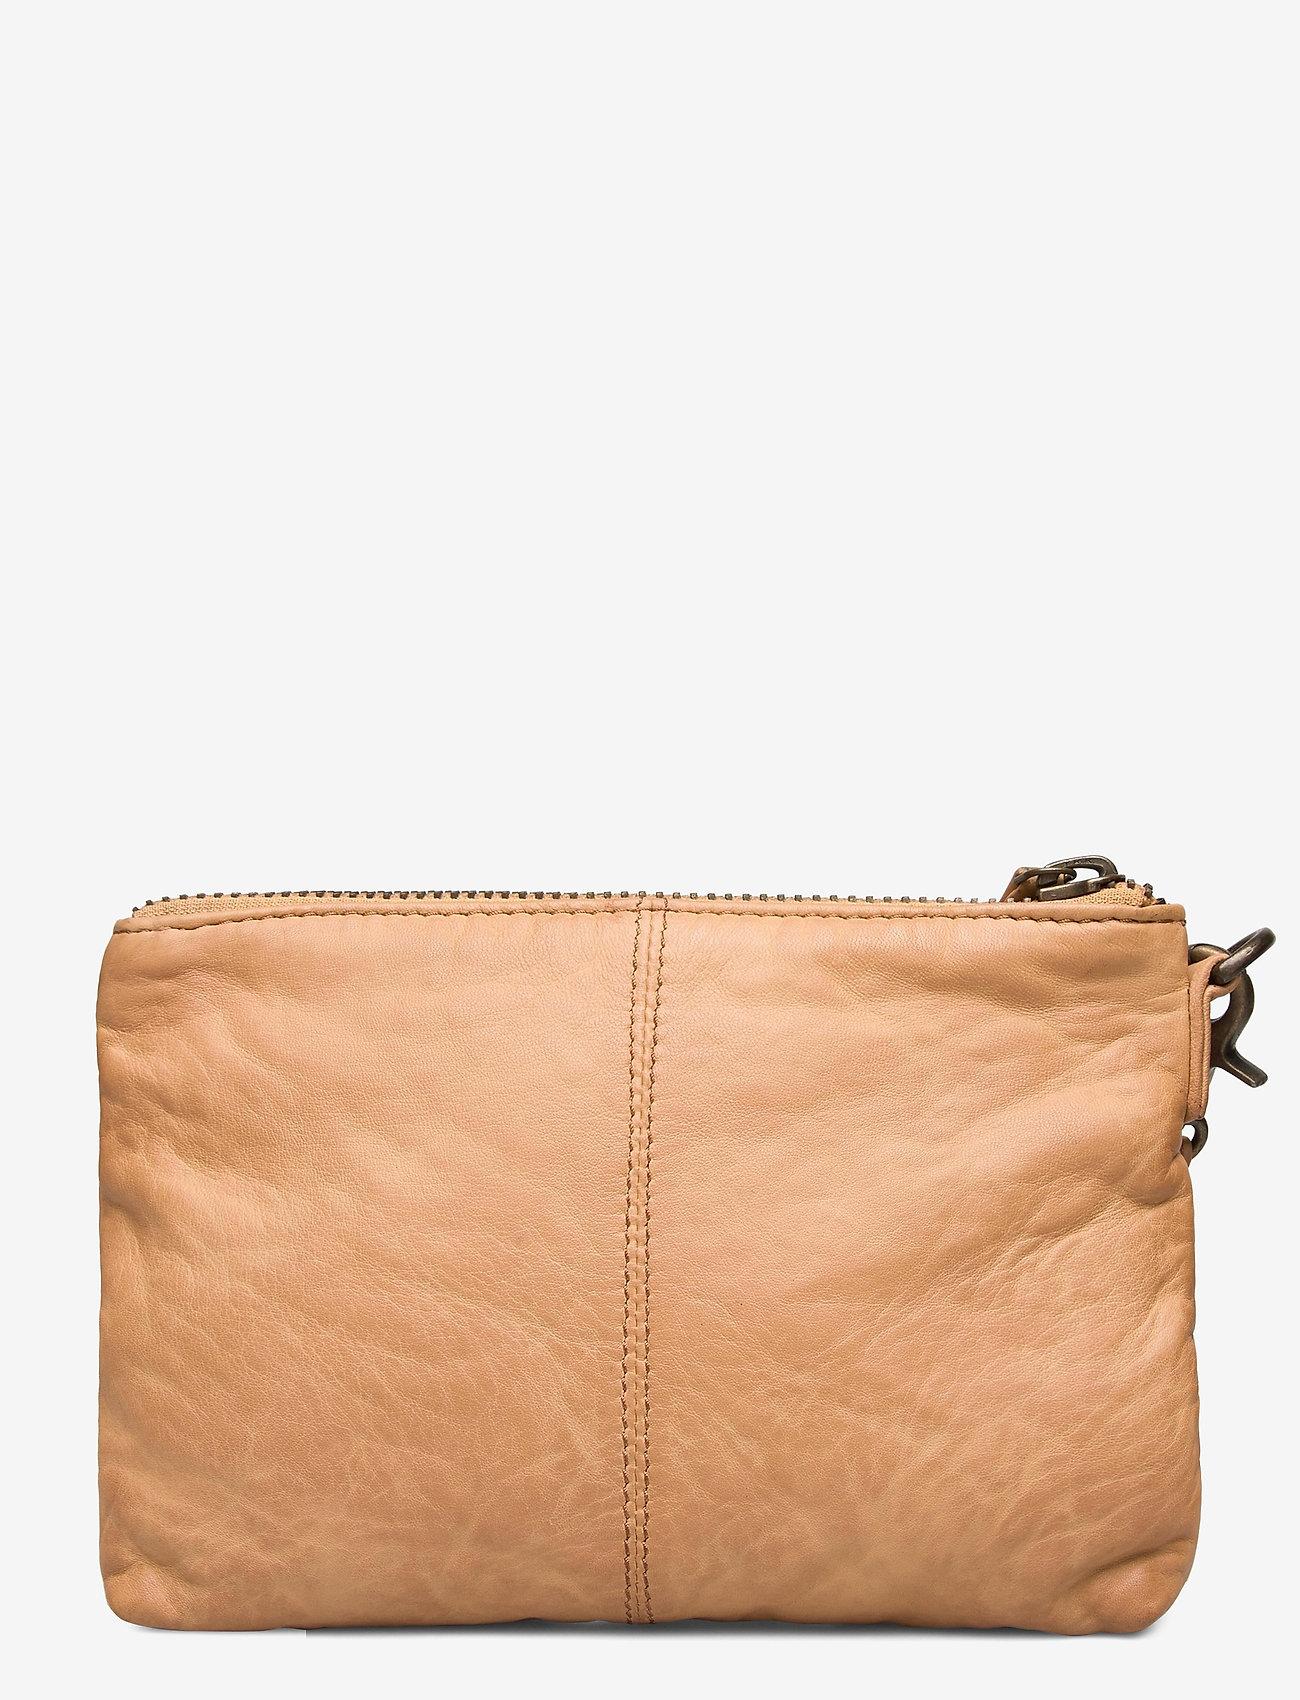 DEPECHE - Cosmetic bag - kirjekuorilaukut - 156 camel - 1